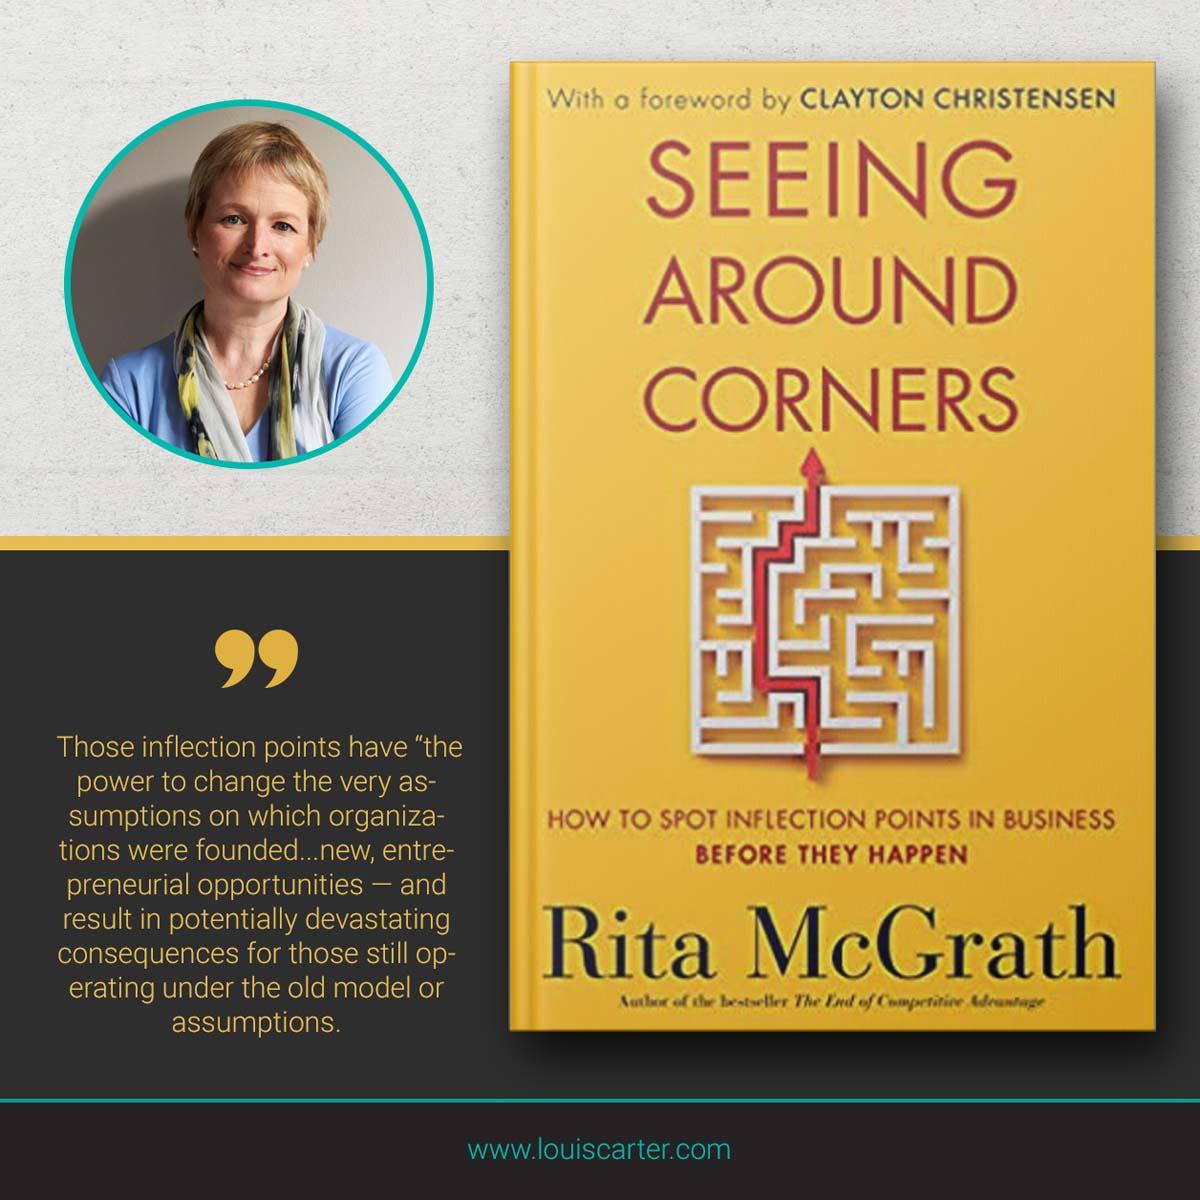 Image of Seeing Around Corners best leadership books by Rita McGrath.